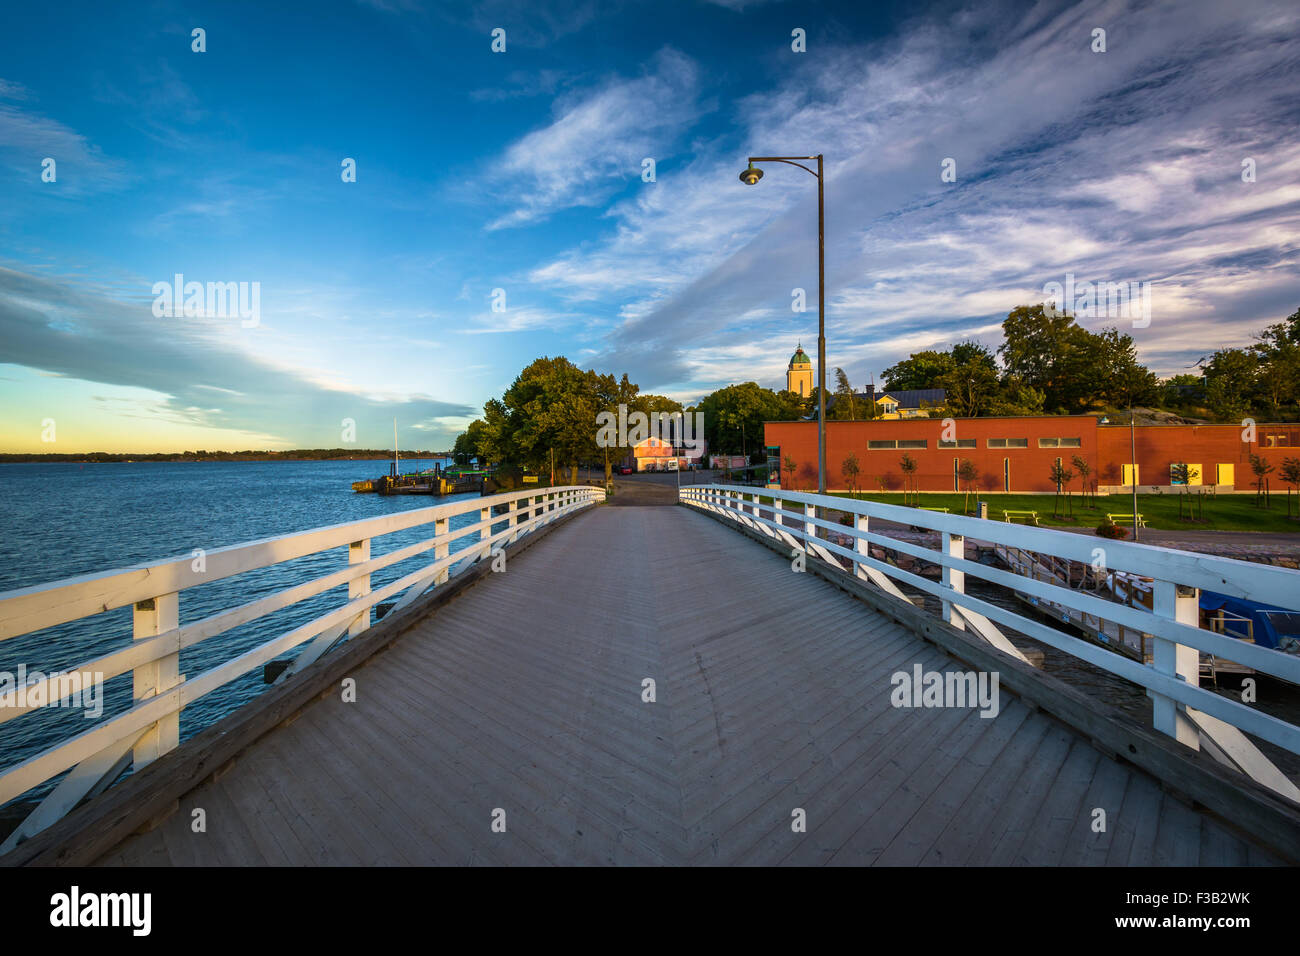 Bridge at Suomenlinna, in Helsinki, Finland. - Stock Image